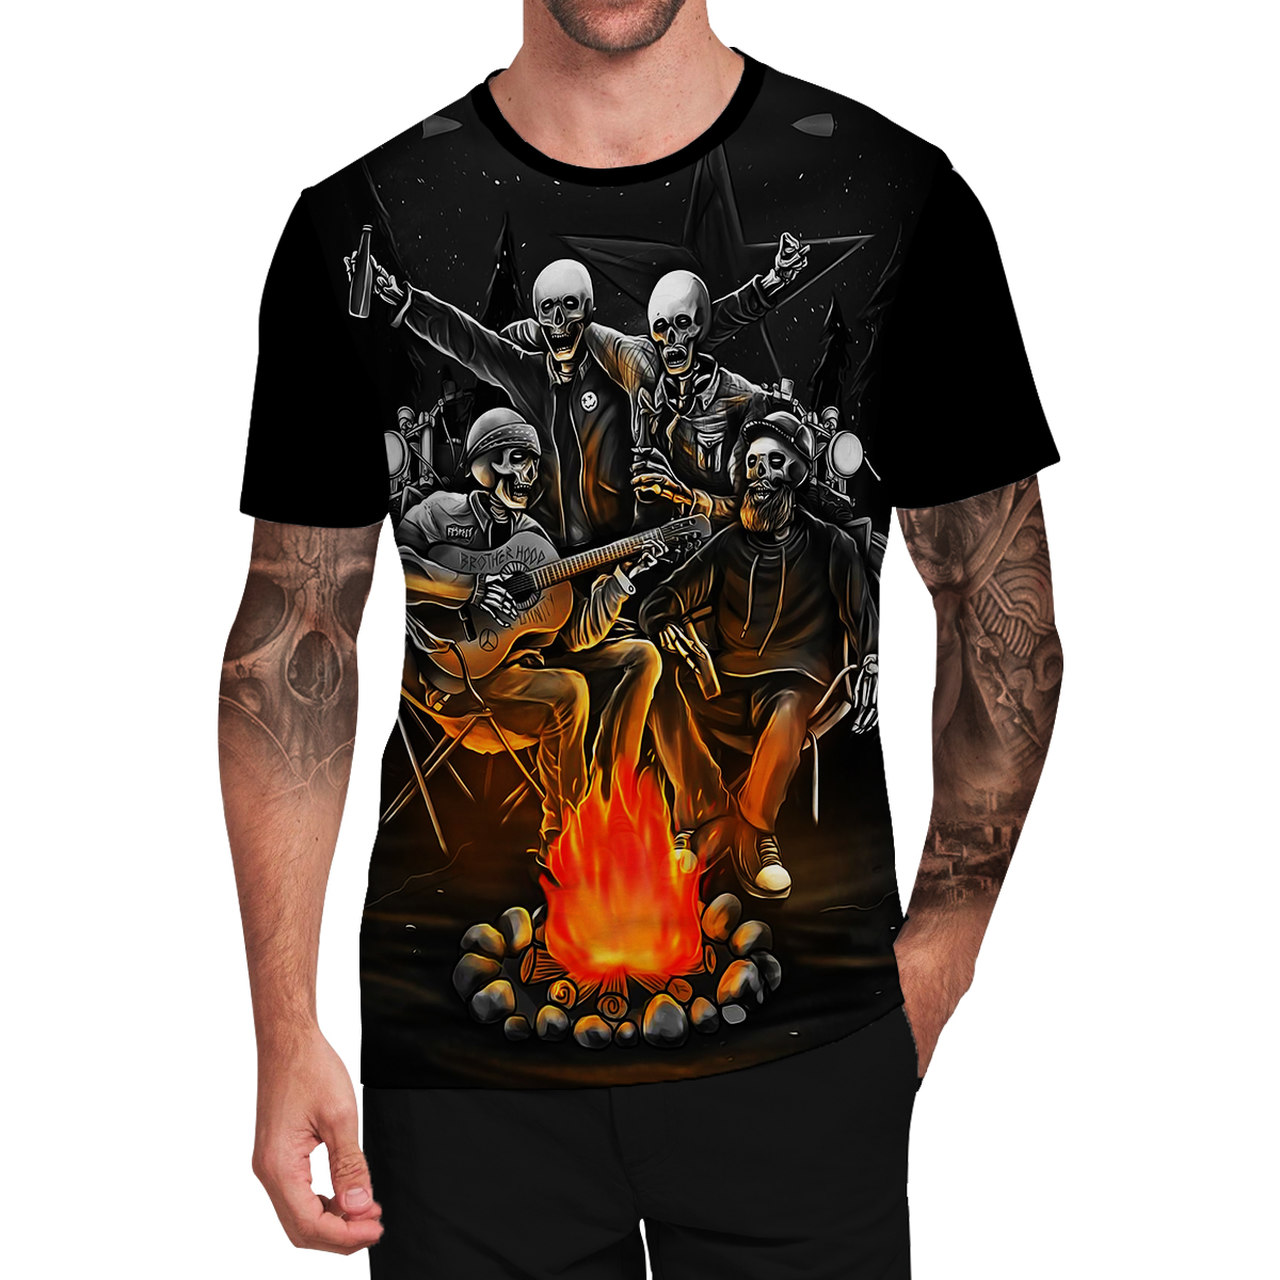 Stompy Camiseta Tattoo Tatuagem Caveira Skull 99